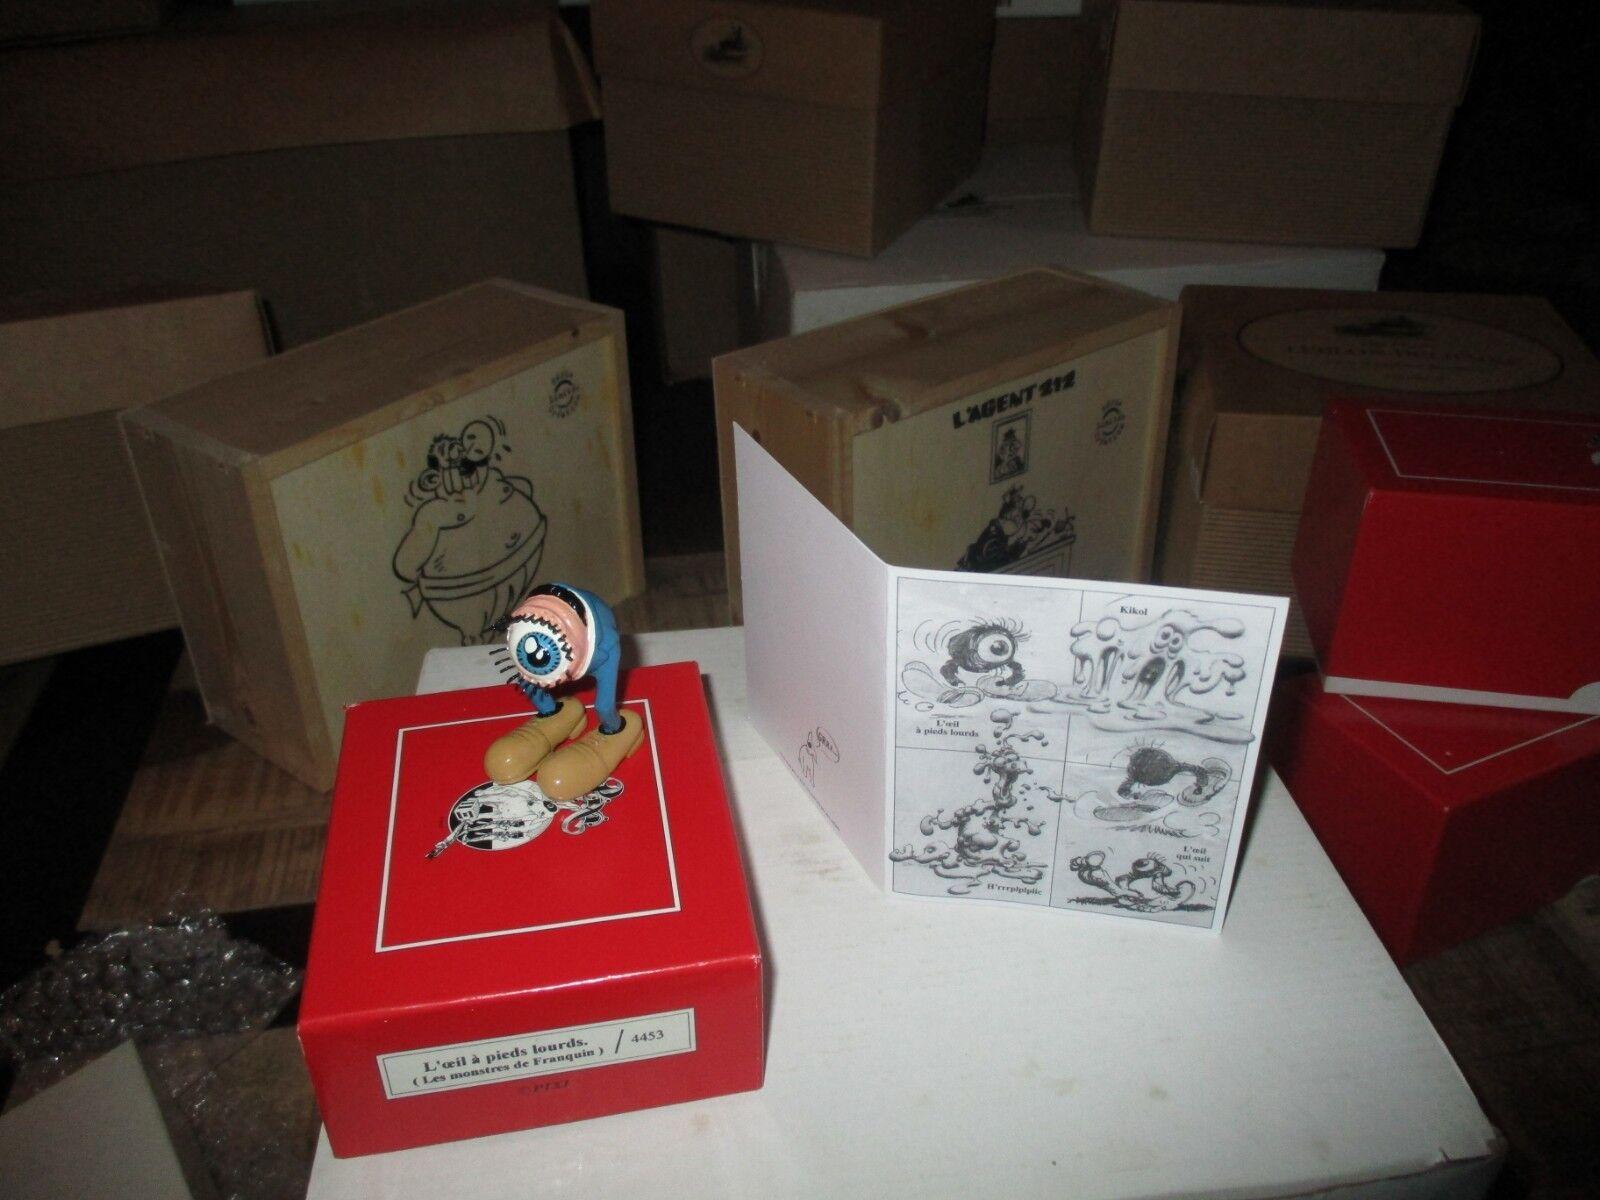 Franquin-Pixi- les monstres de Franquin-L oeil a pieds lourds-500 exempl.